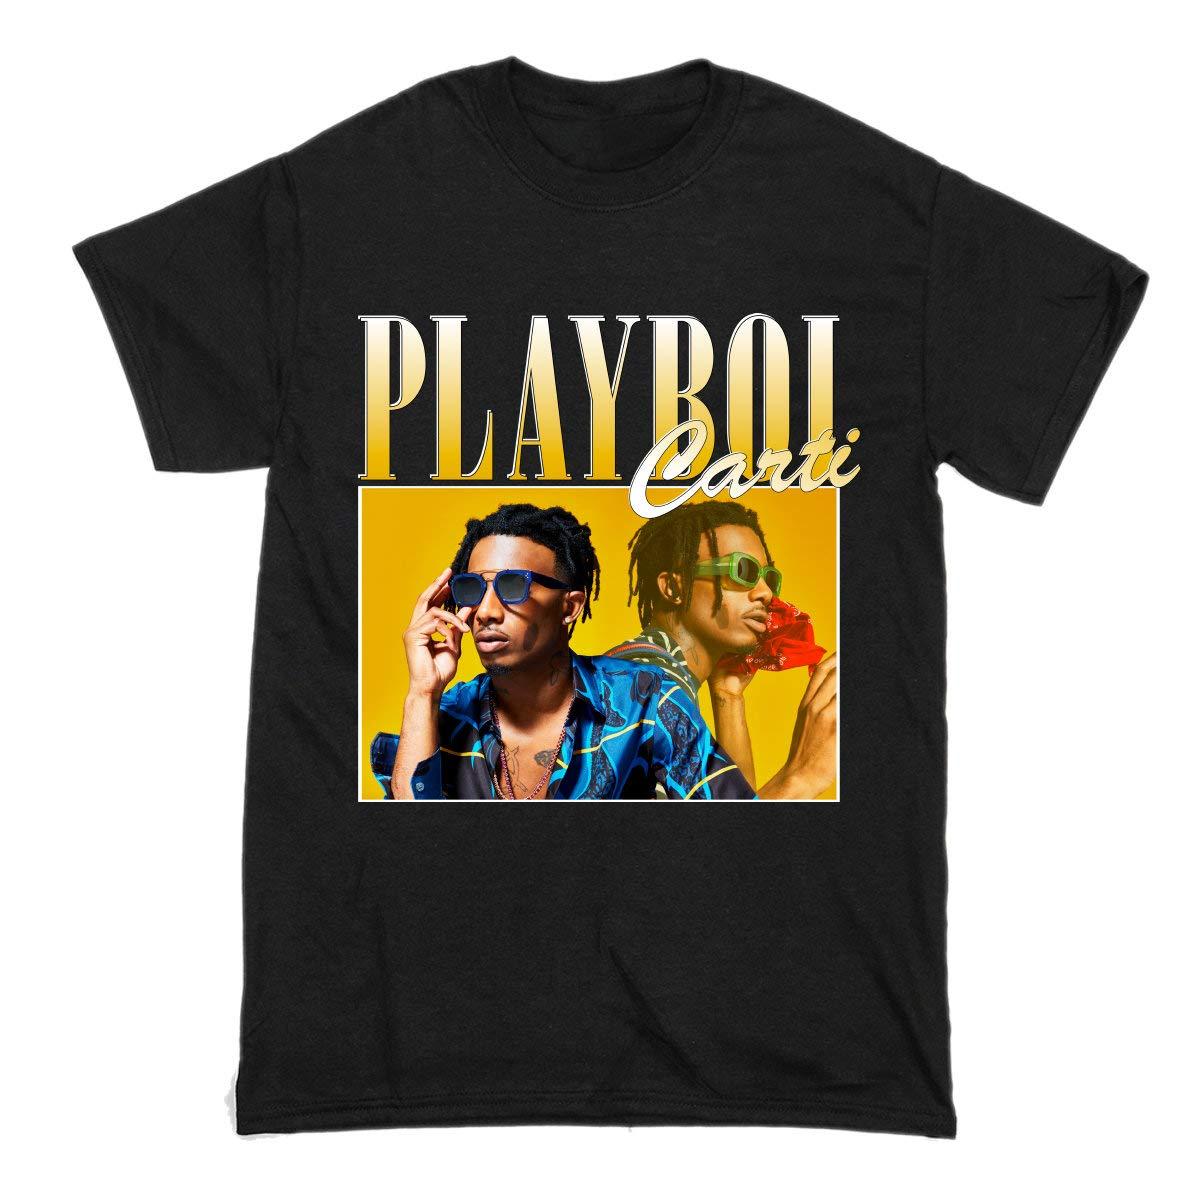 Playboi Carti Gift For Men Woman Shirts